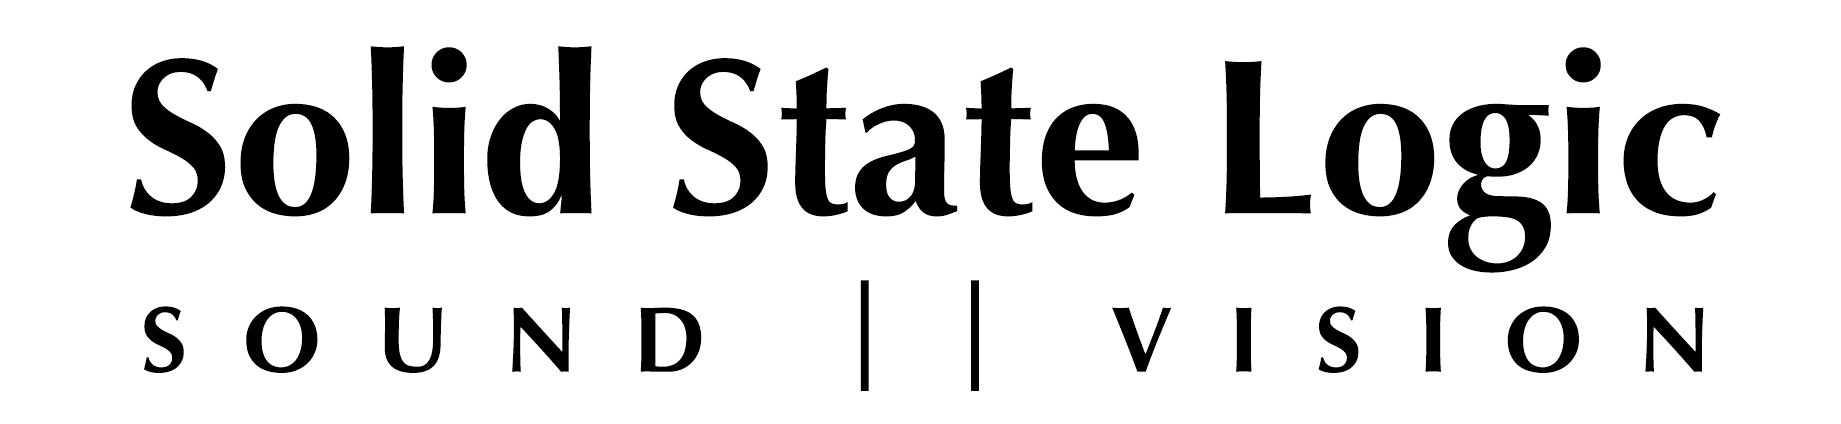 Solid State Logic Integrator